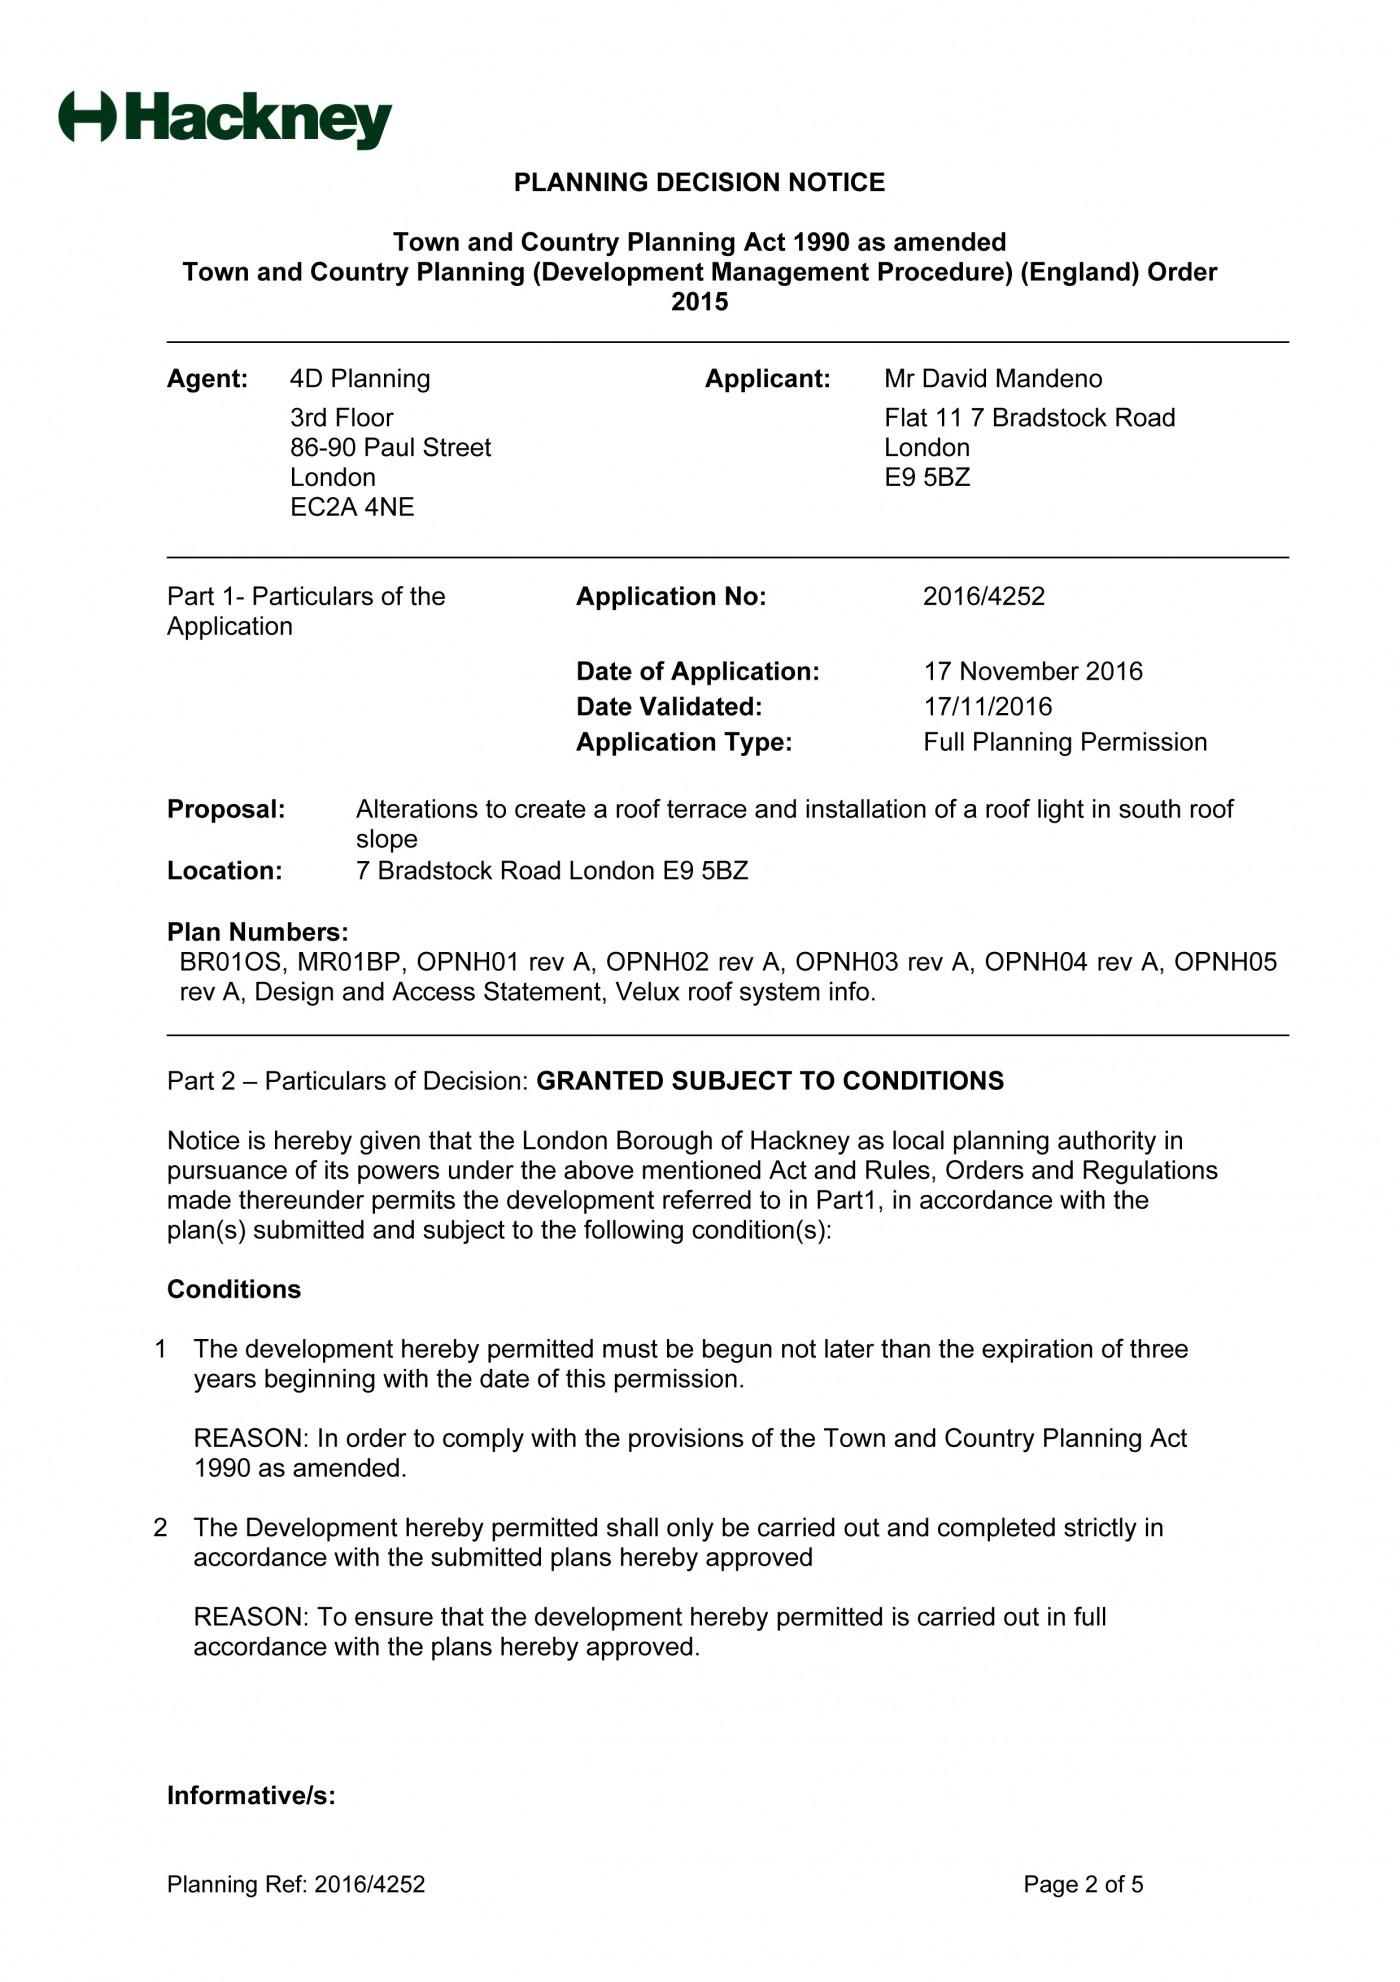 decision notice - Hackney - roof terrace -1